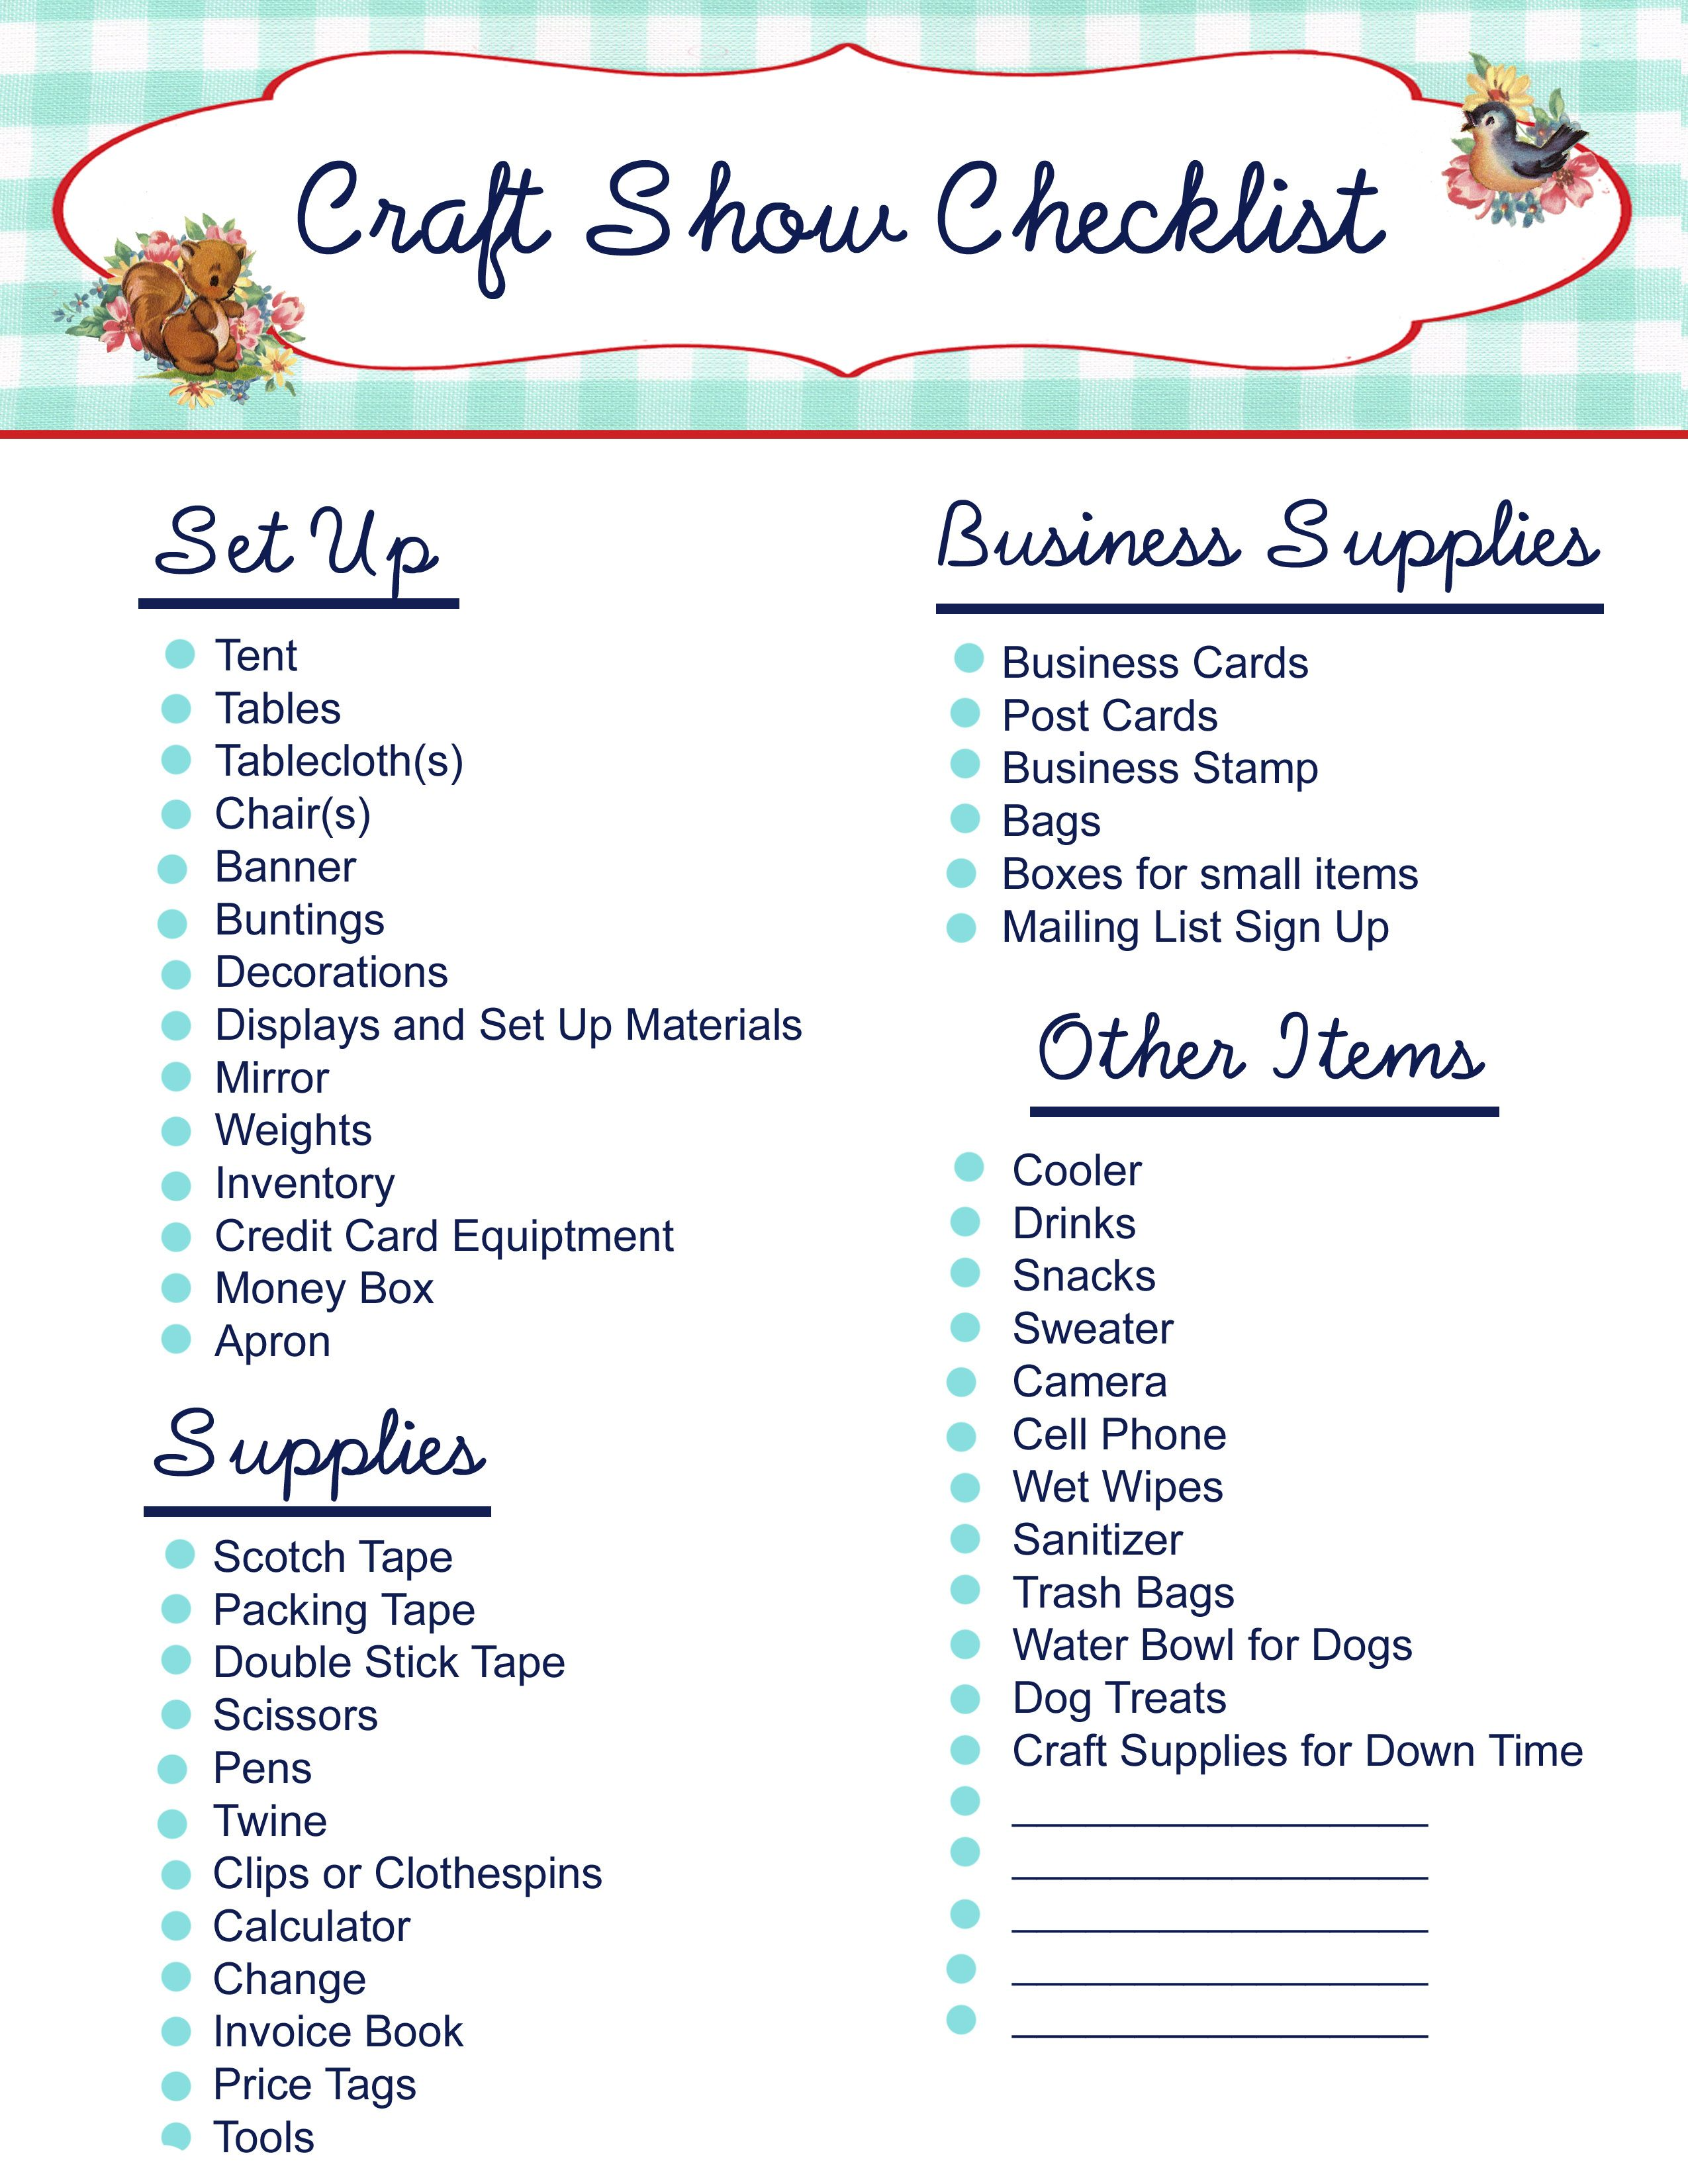 Free Printable Craft Show Checklist